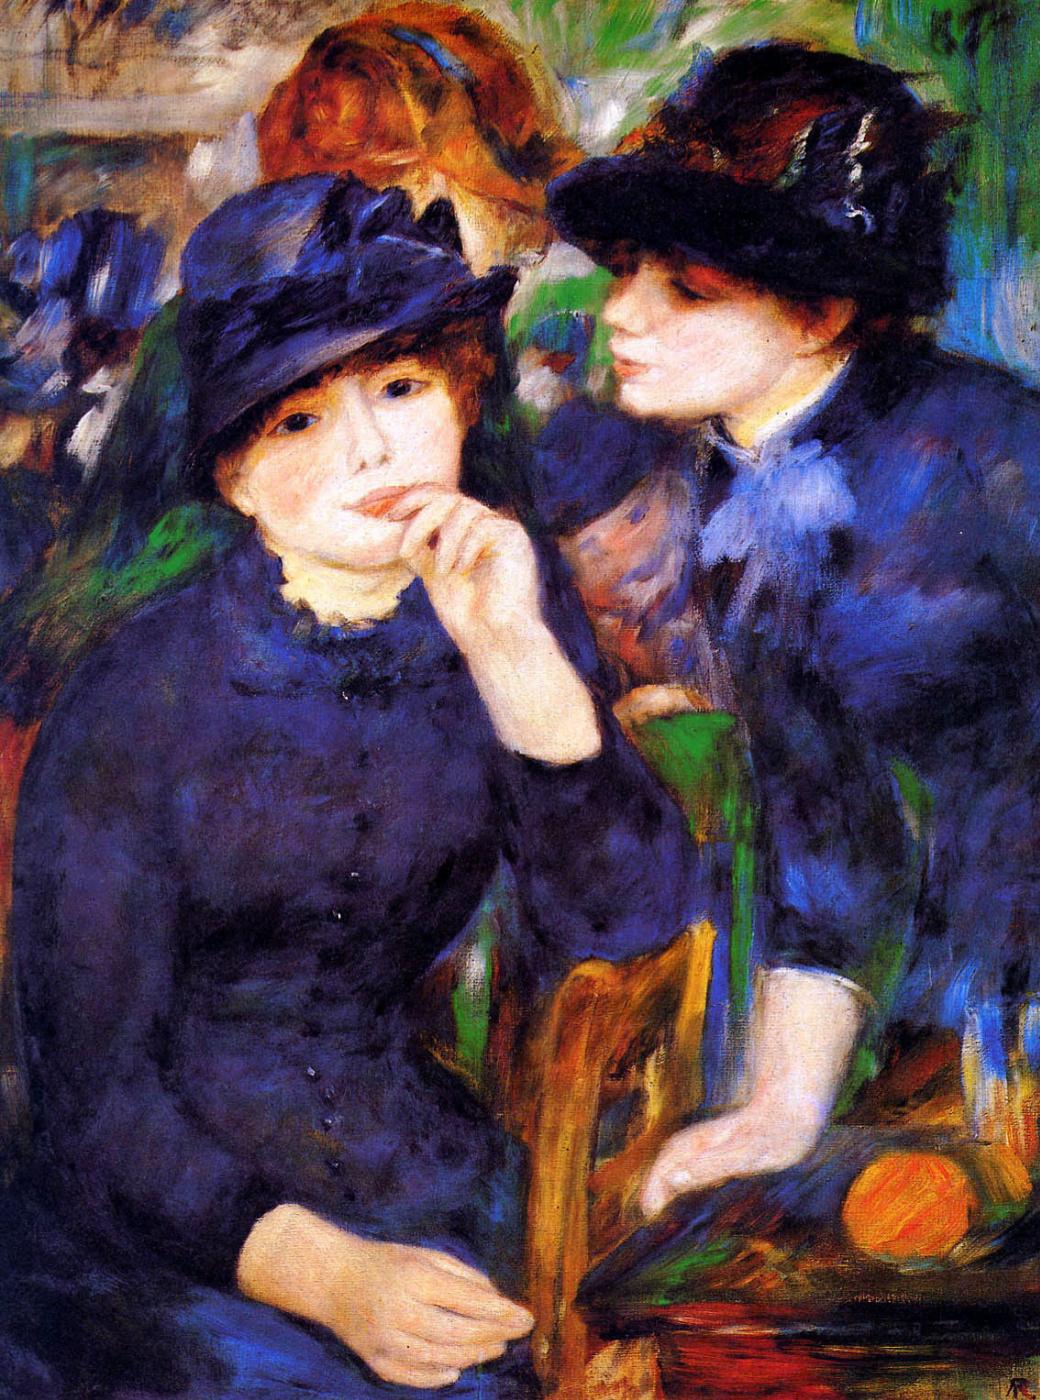 Pierre-Auguste Renoir. Two Girls in Black